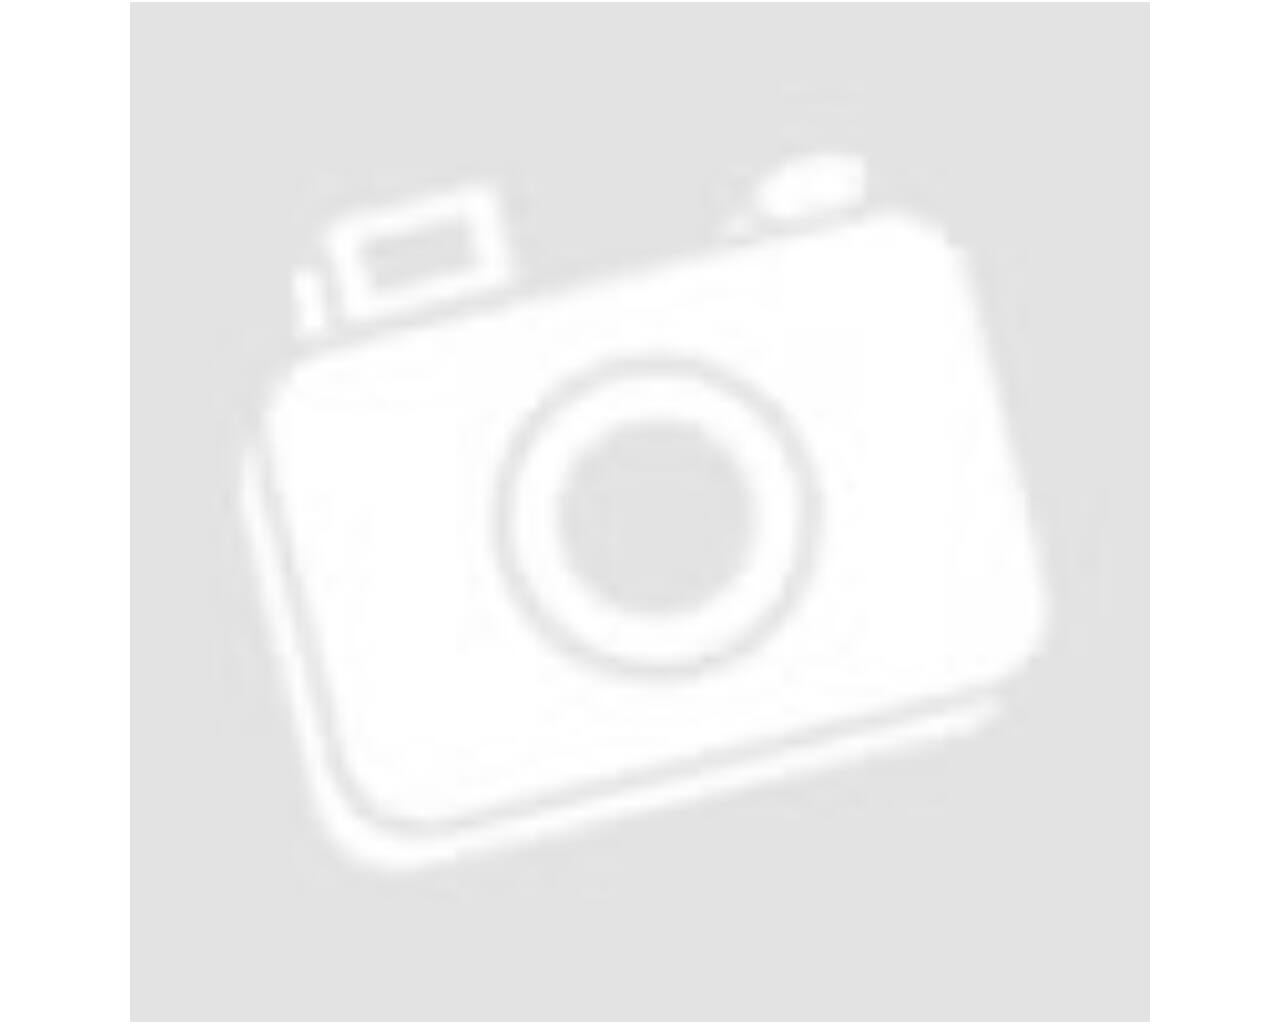 KLIMA inverter Ariston Prios 35, 12000 BTU